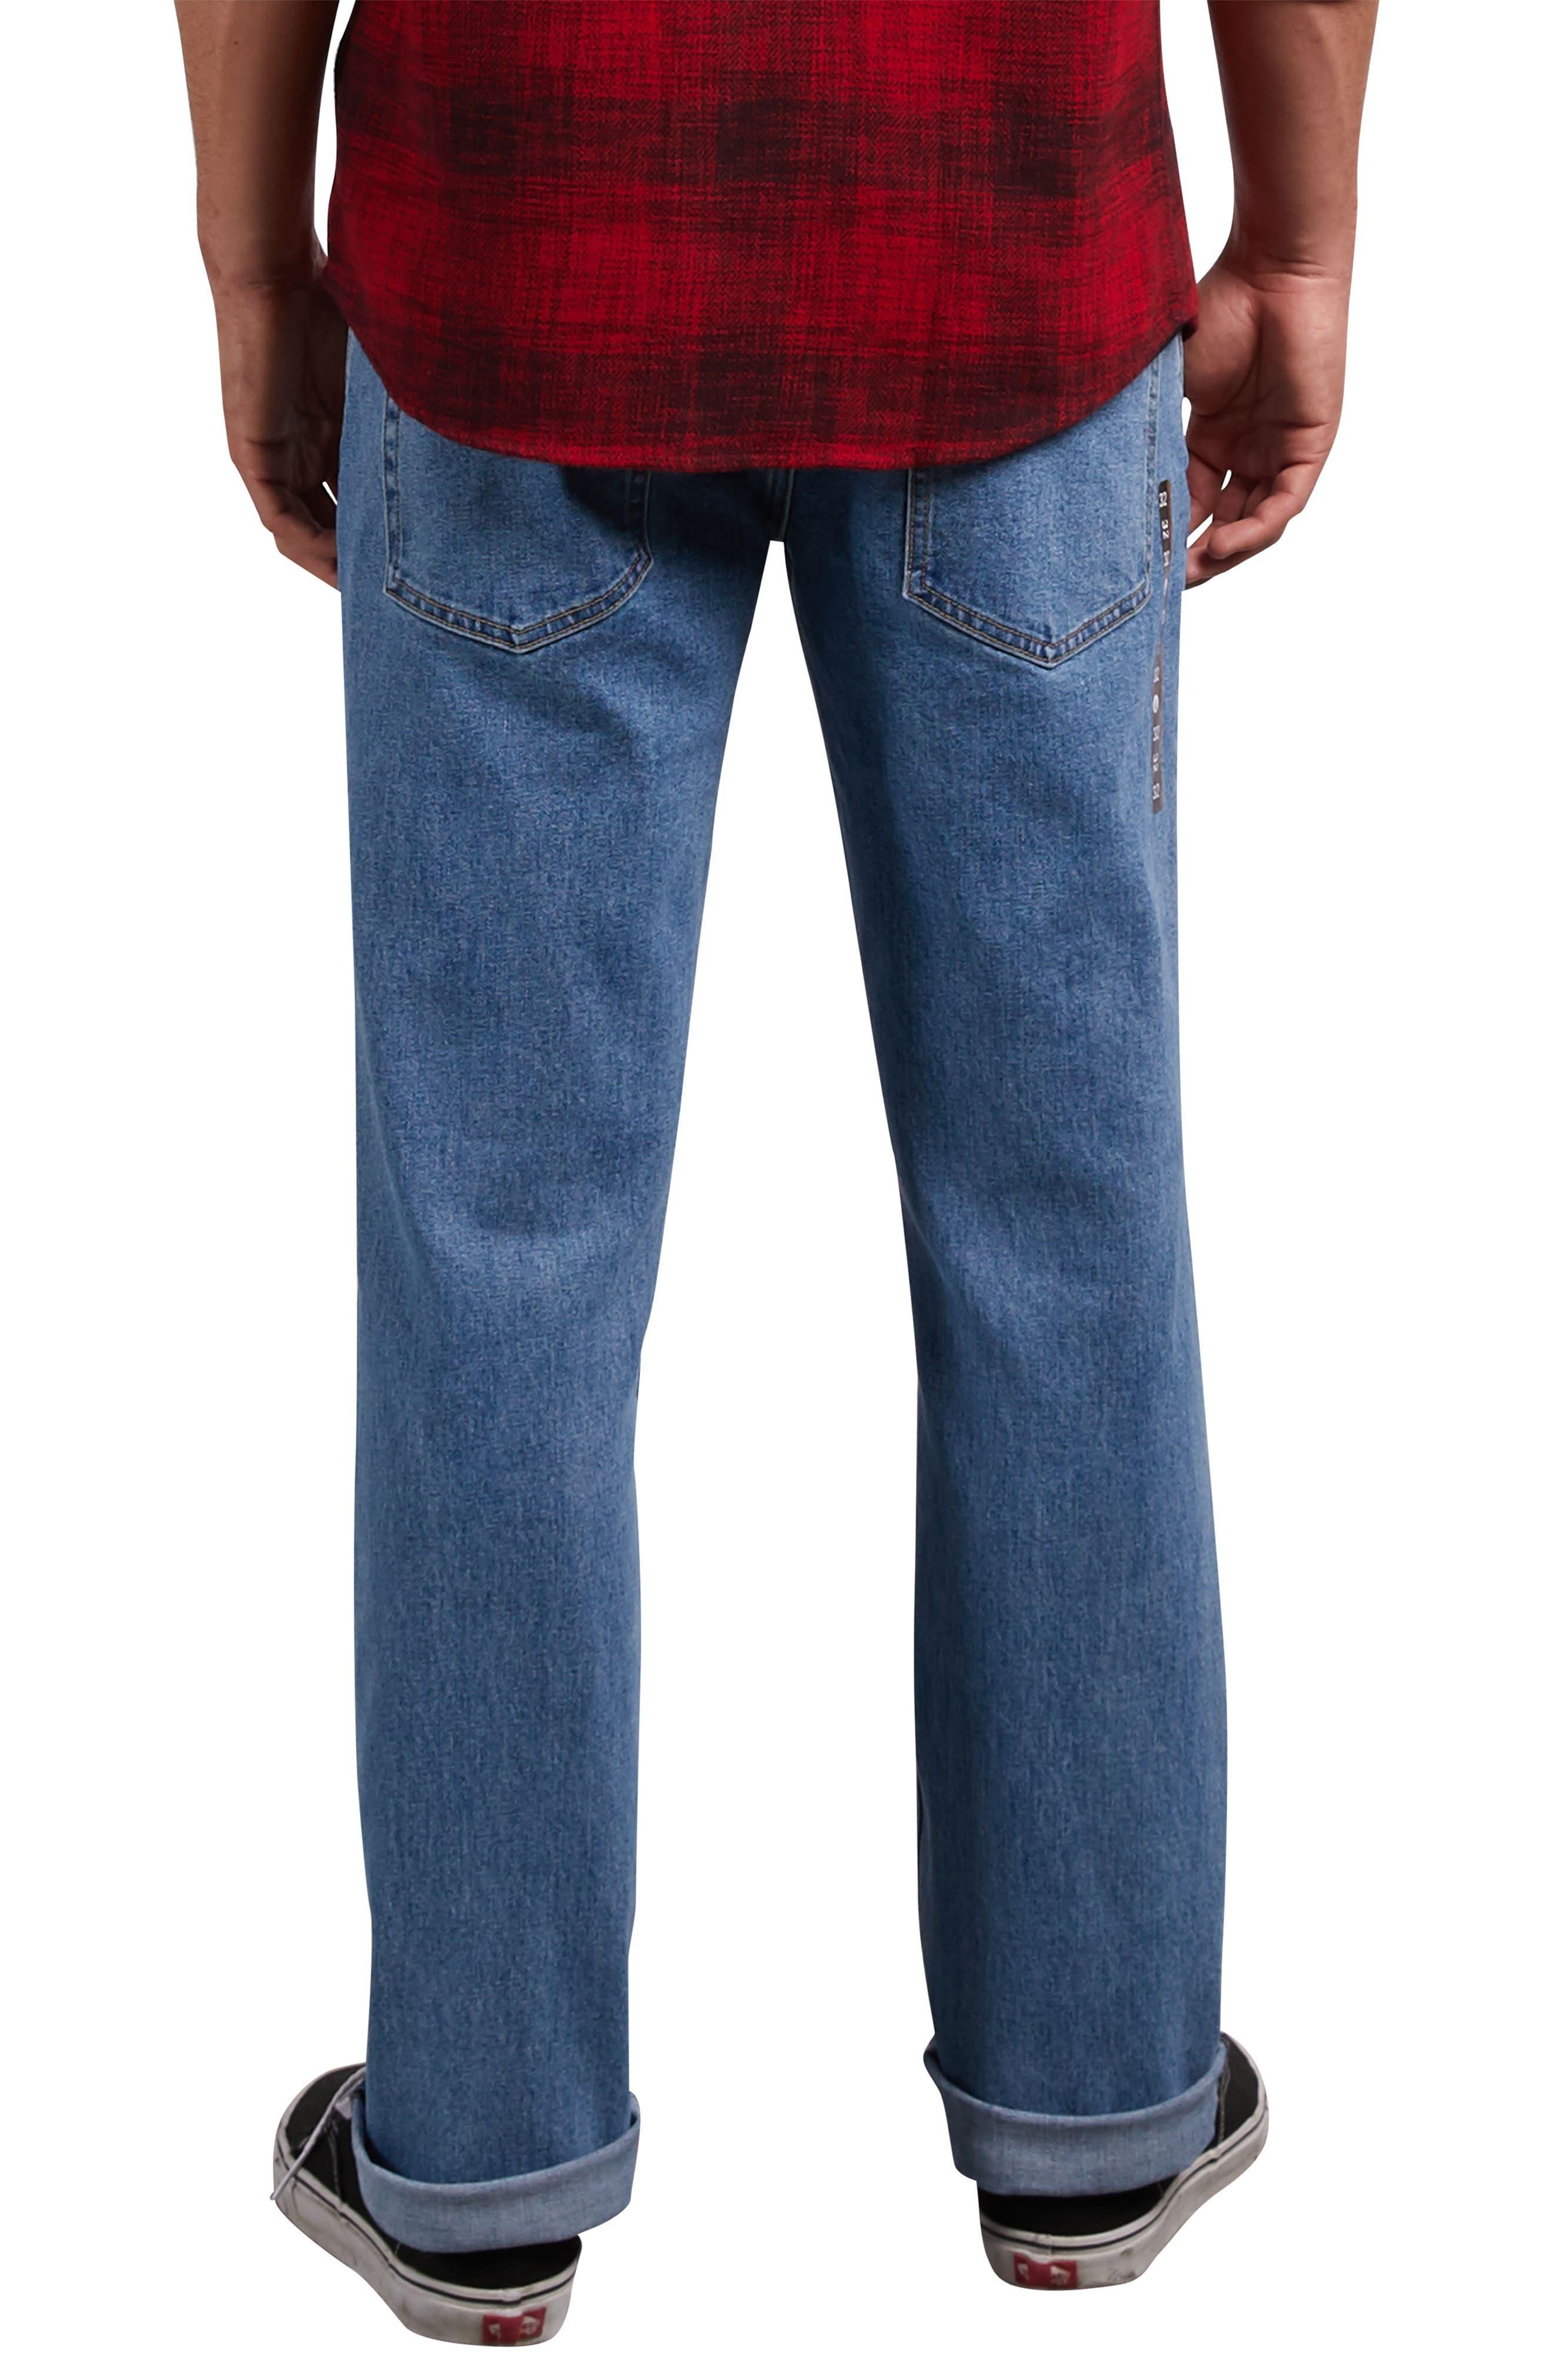 Solver Straight Leg Jeans,                             Alternate thumbnail 2, color,                             STONE BLUE